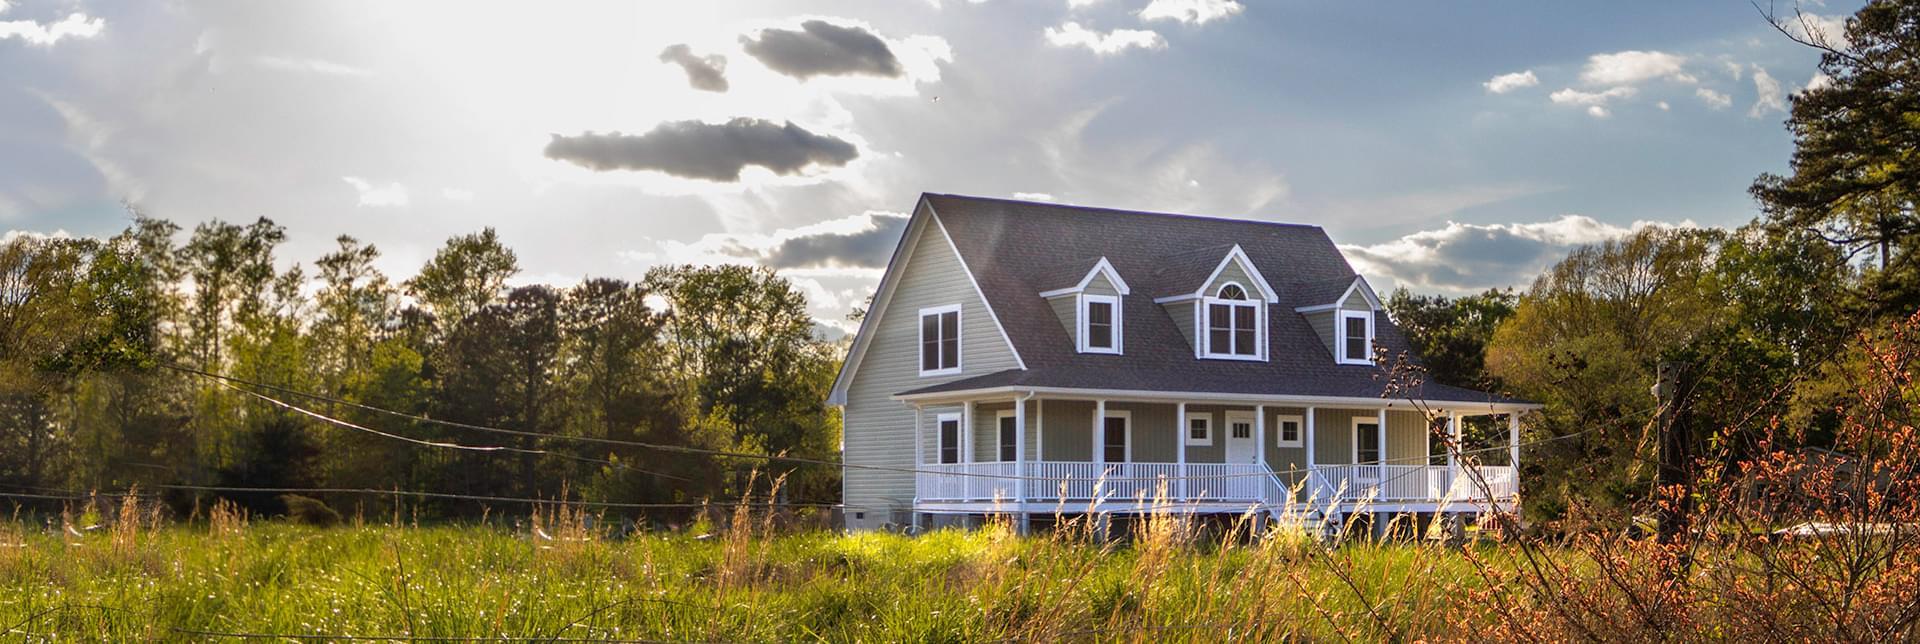 New Homes in Mathews County VA